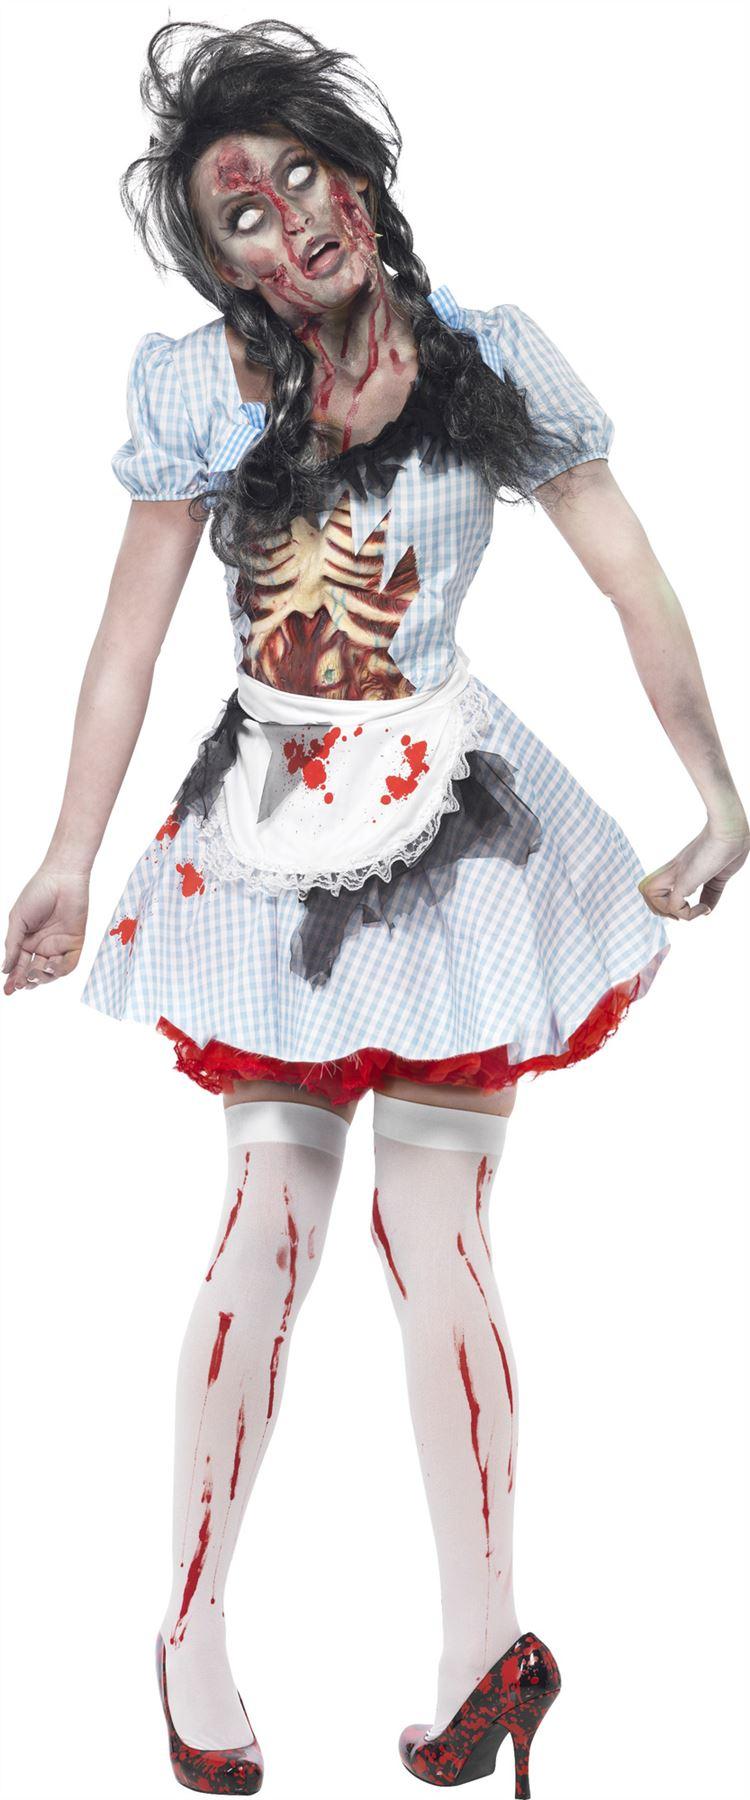 de zombie para Dama Disfraz Dorothy miedo Halloween Mujer Adulto eBay